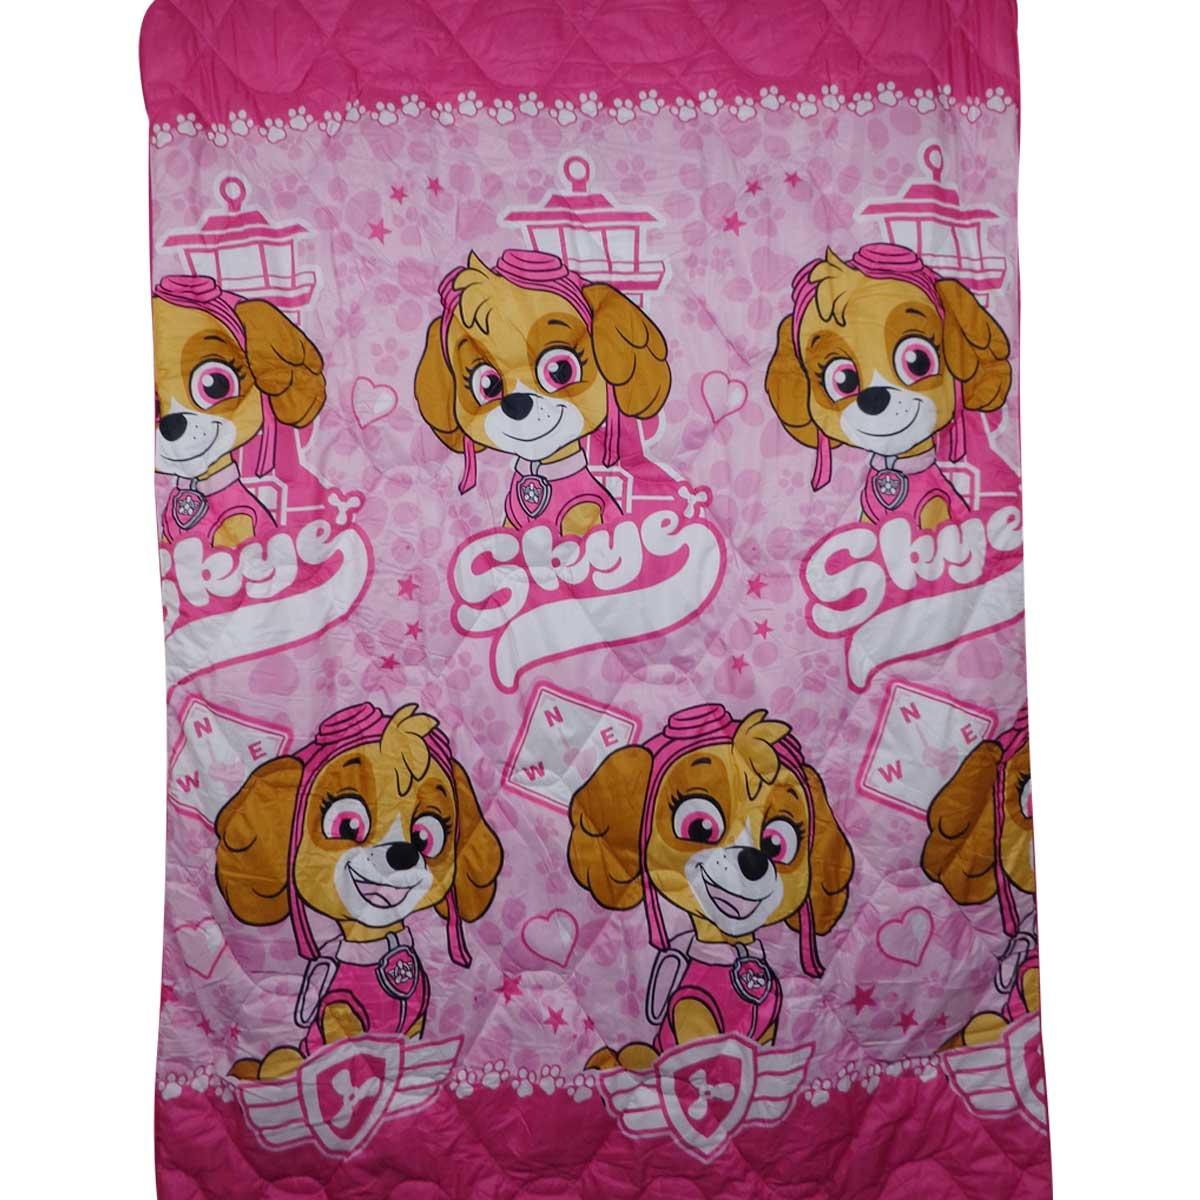 Kit Infantil Patrulha Canina Menina Rosa Jogo De Cama + Edredom Lepper